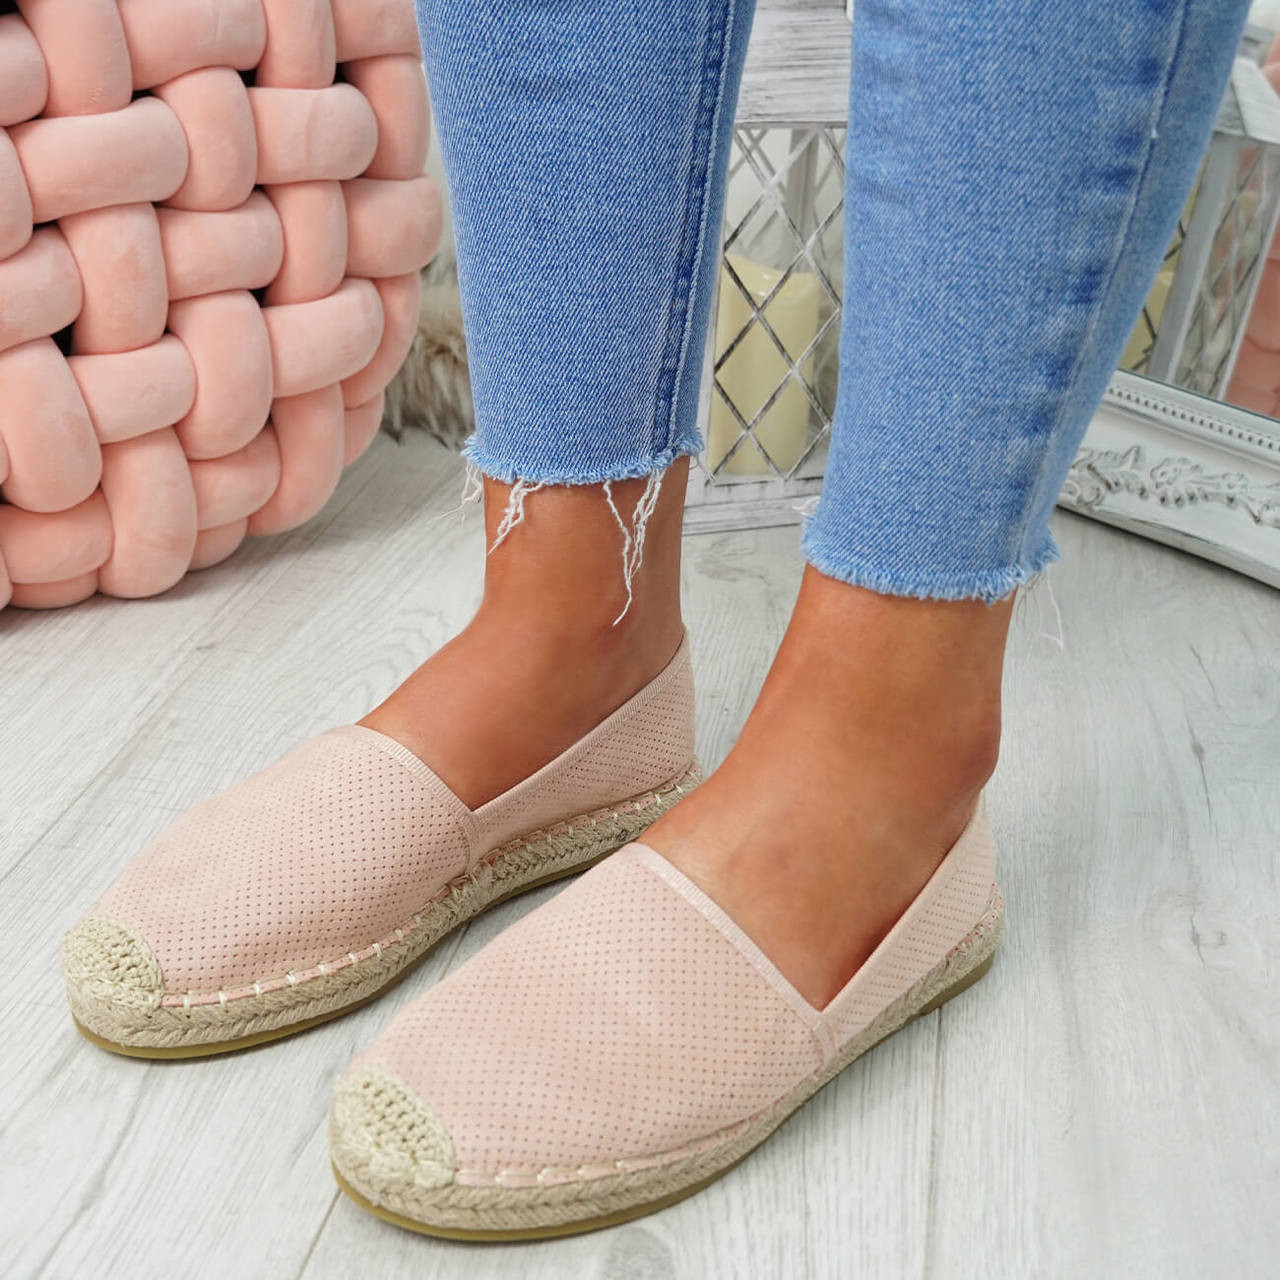 d3ae68572 Womens Ladies Flat Espadrille Ballerinas Slip On Flats Summer Shoes Size